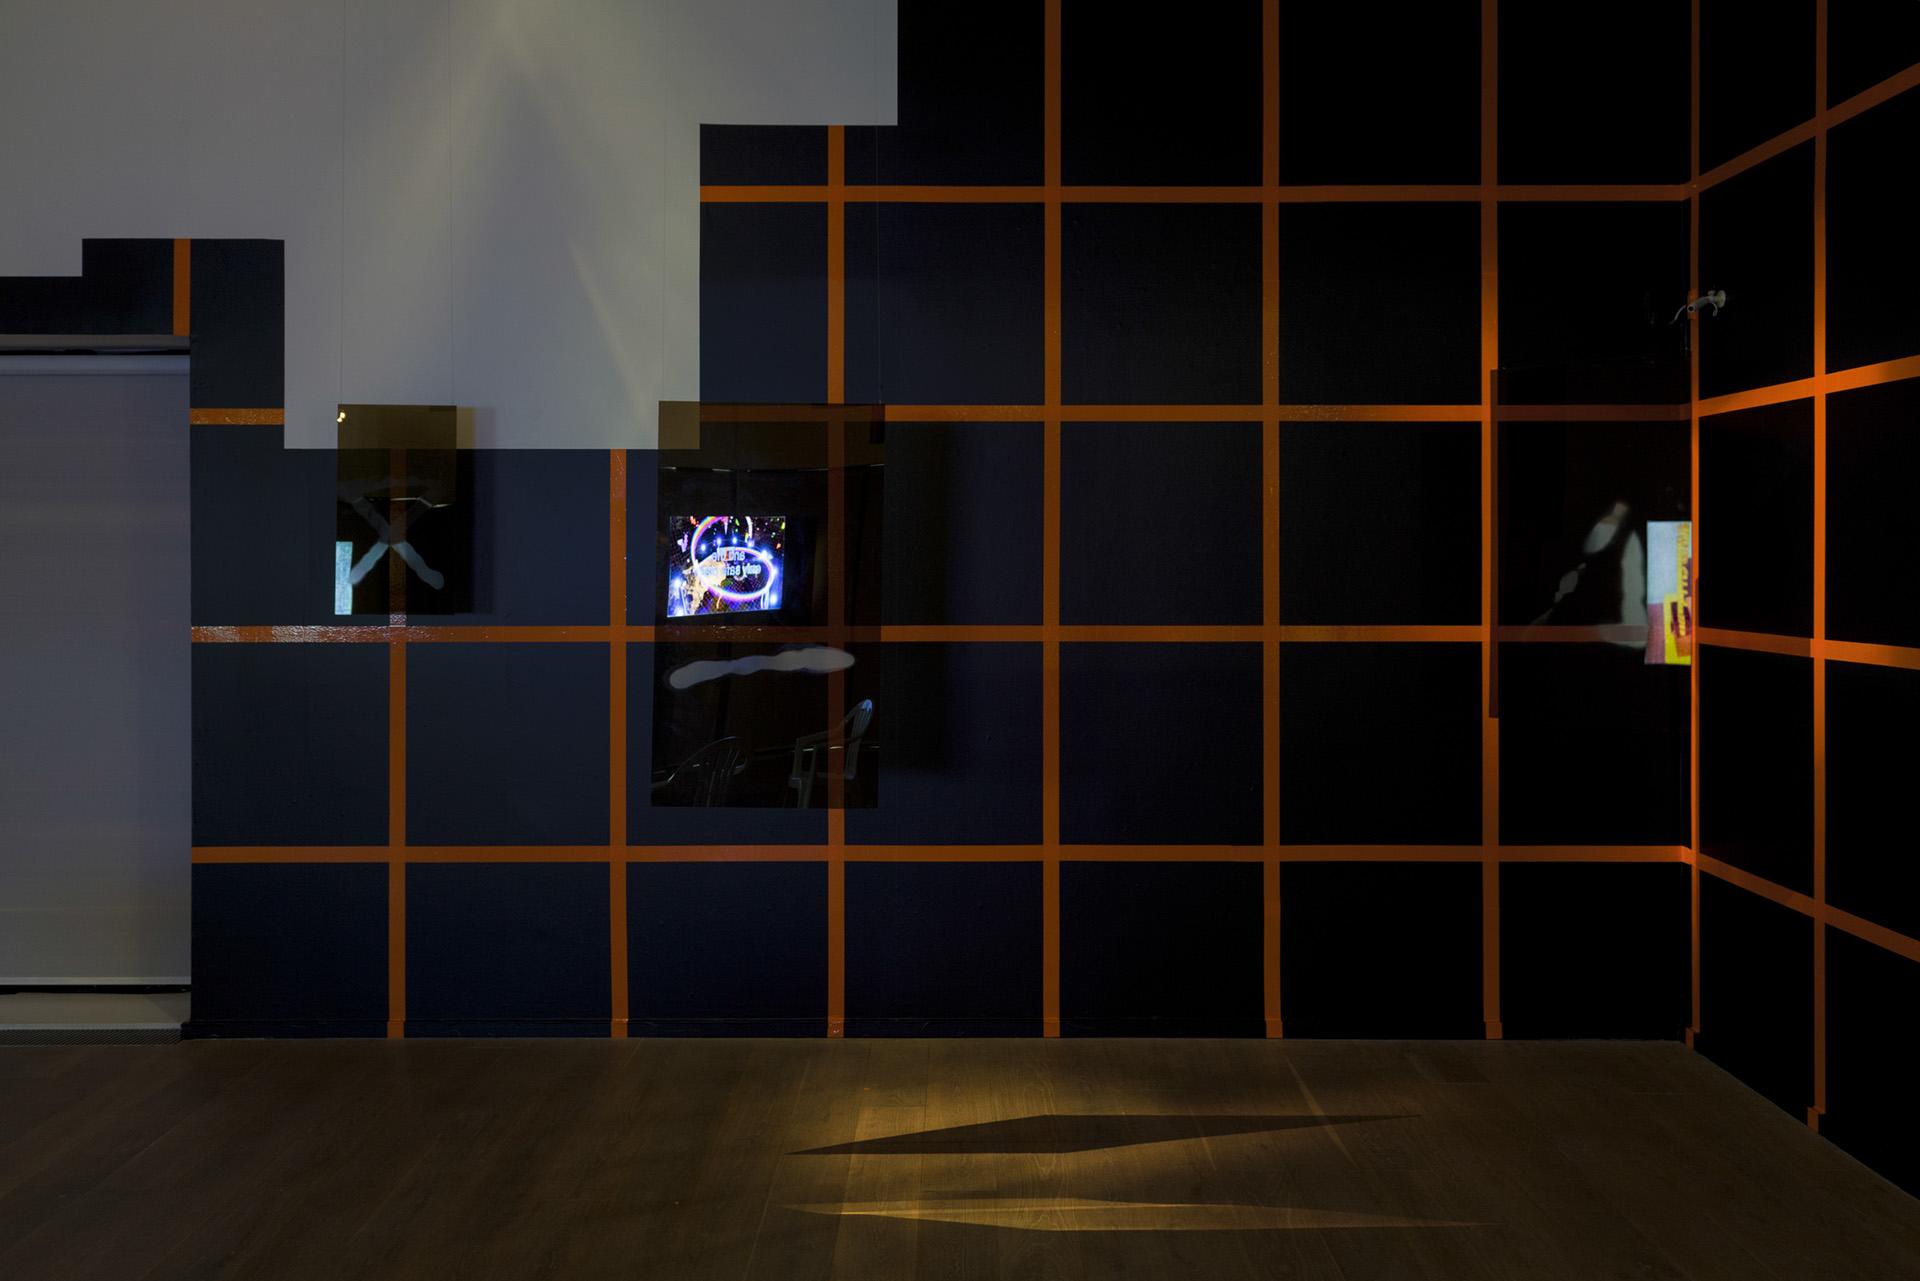 Installation view of Gallery 2, Solstice Arts Centre, Ireland.